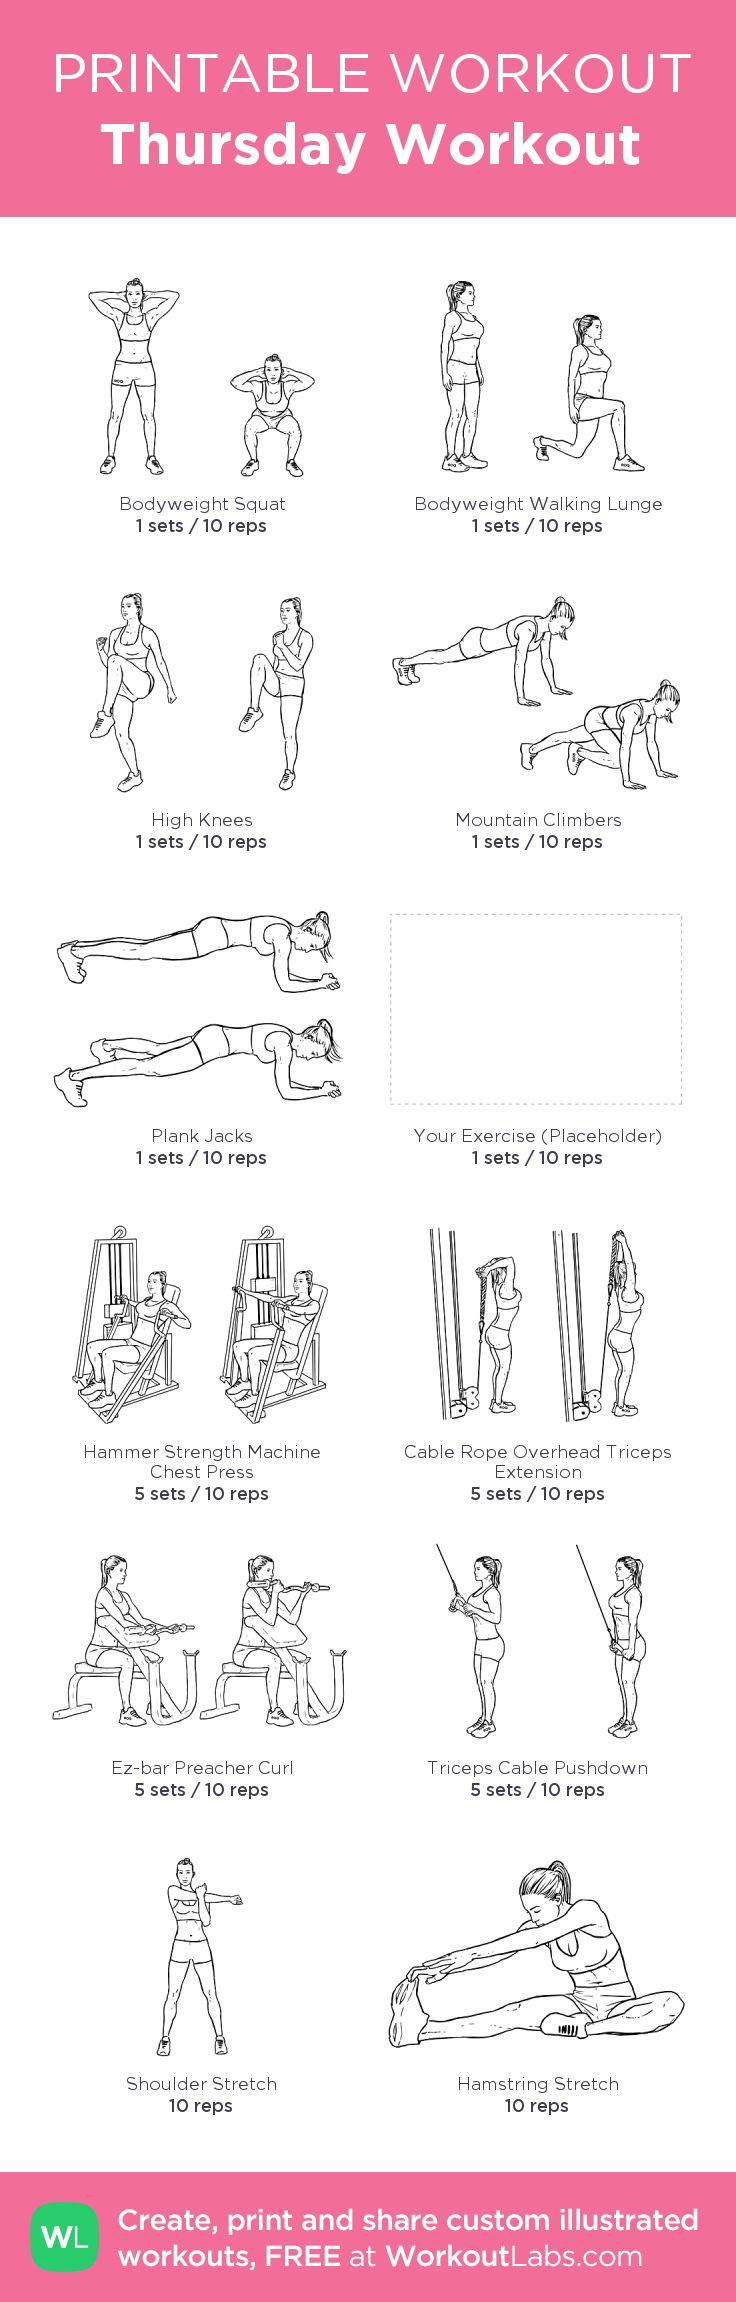 Thursday Workout:my custom printable workout by @WorkoutLabs #workoutlabs #customworkout